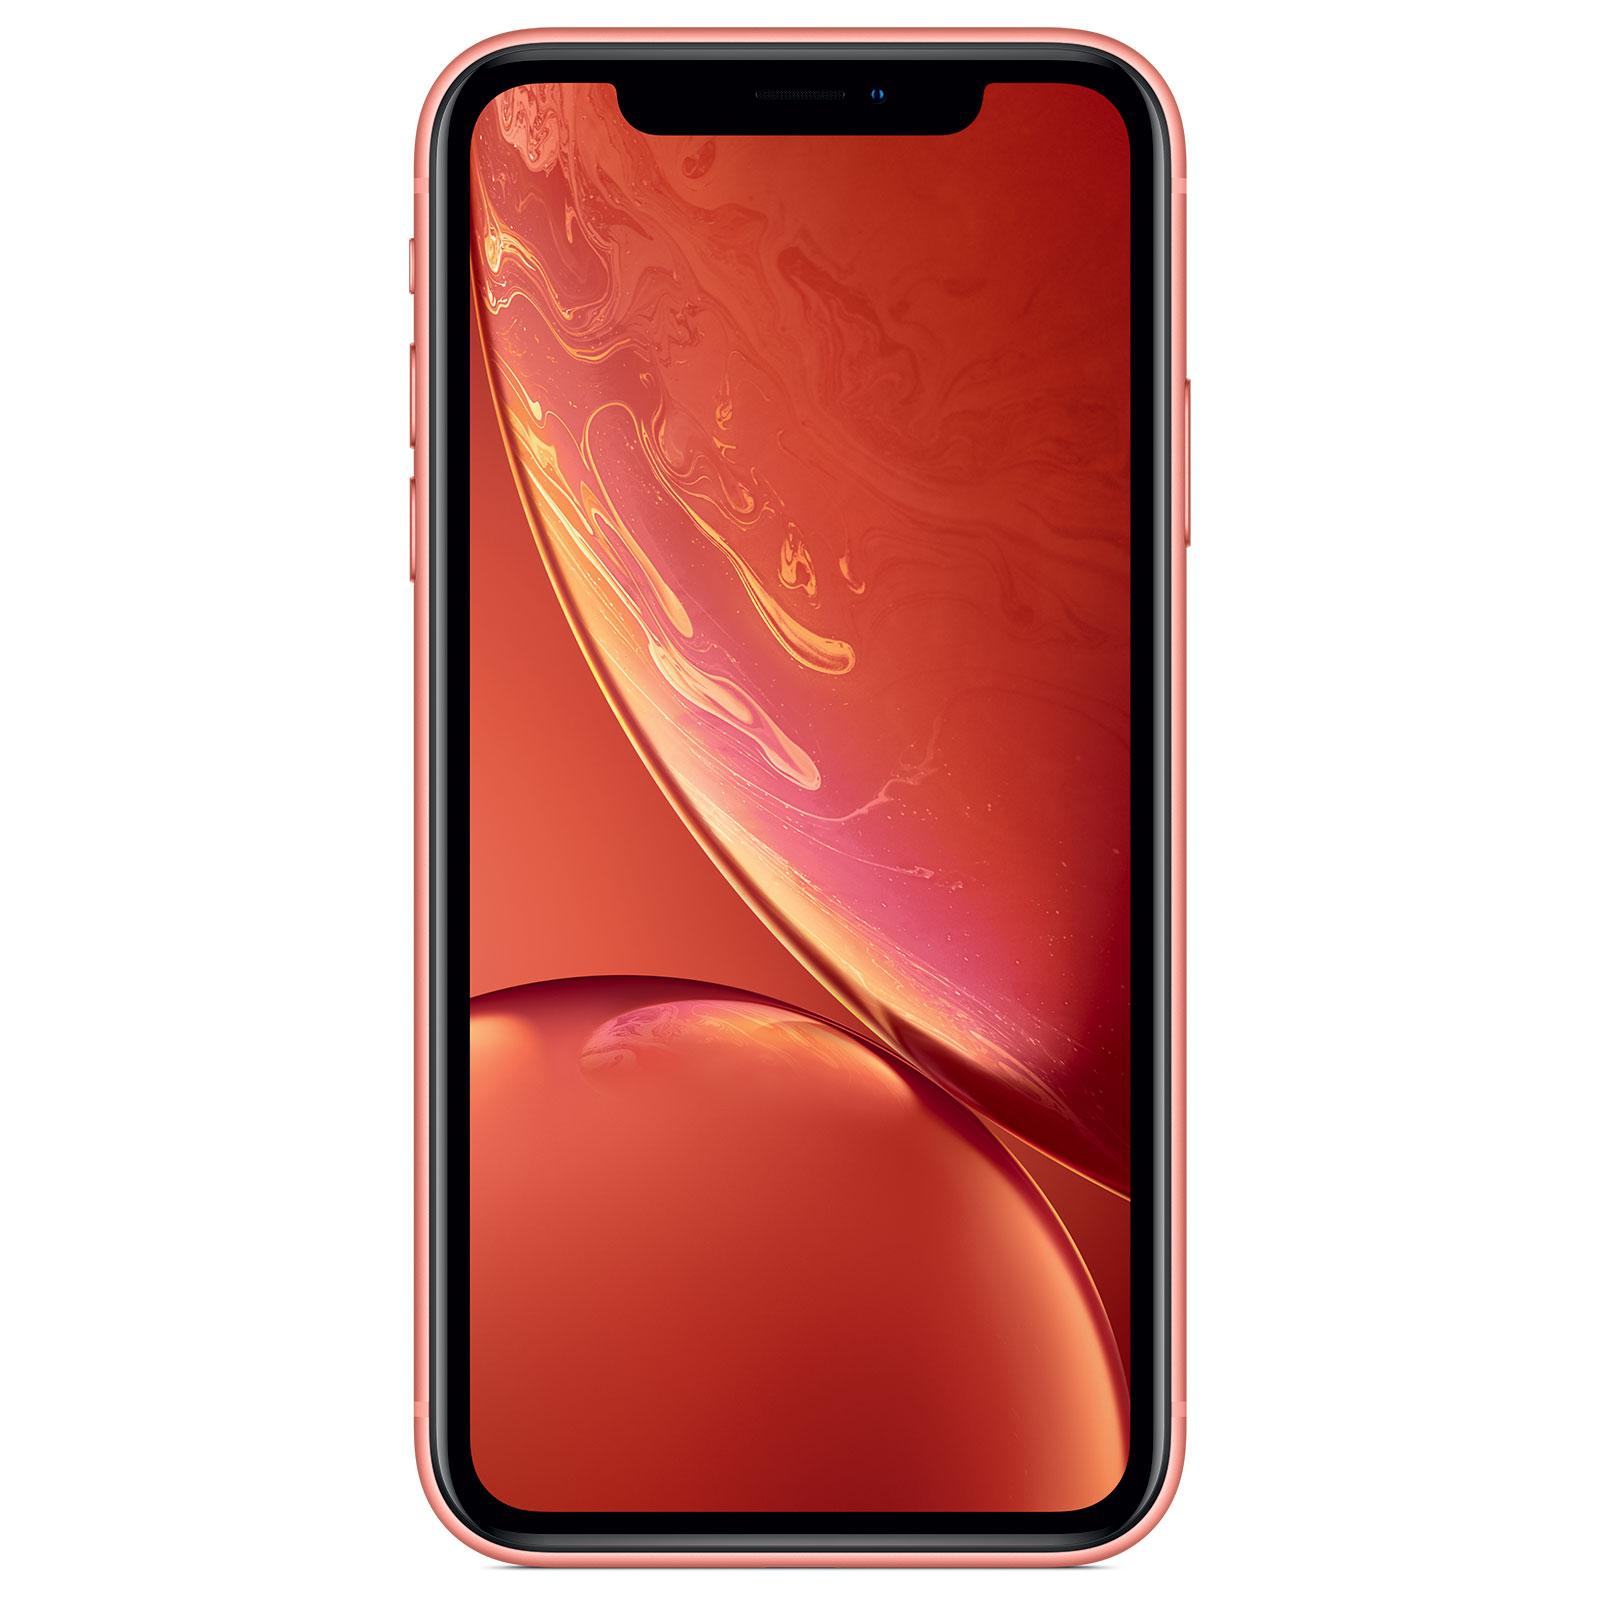 "Mobile & smartphone Apple iPhone XR 128 Go Corail Smartphone 4G-LTE Advanced IP67 Dual SIM - Apple A12 Bionic Hexa-Core - RAM 3 Go - Ecran 6.1"" 828 x 1792 - 128 Go - NFC/Bluetooth 5.0 - iOS 12"